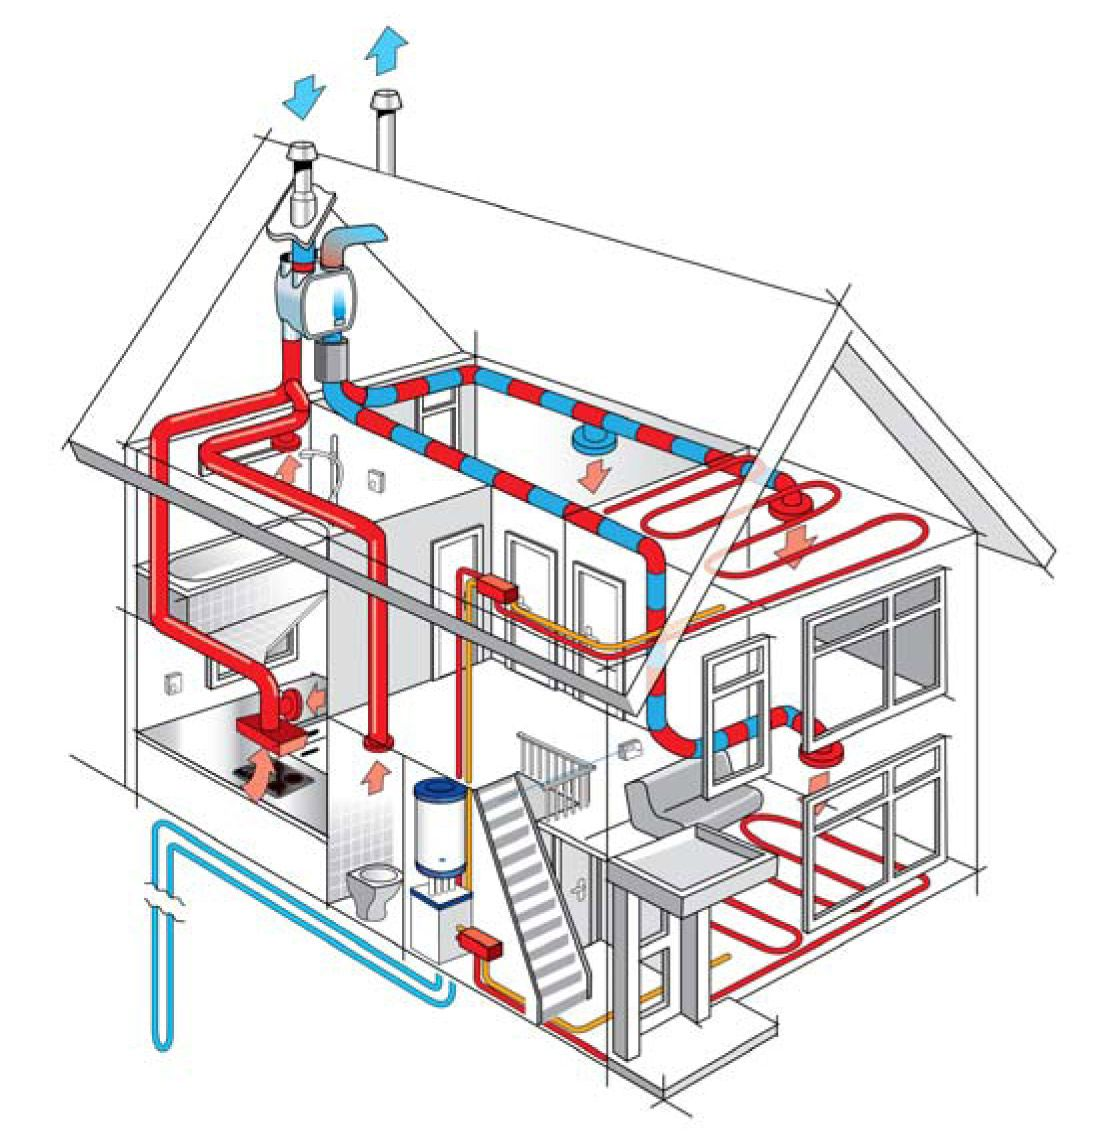 heat recovery ventilator diagram google search [ 1095 x 1140 Pixel ]